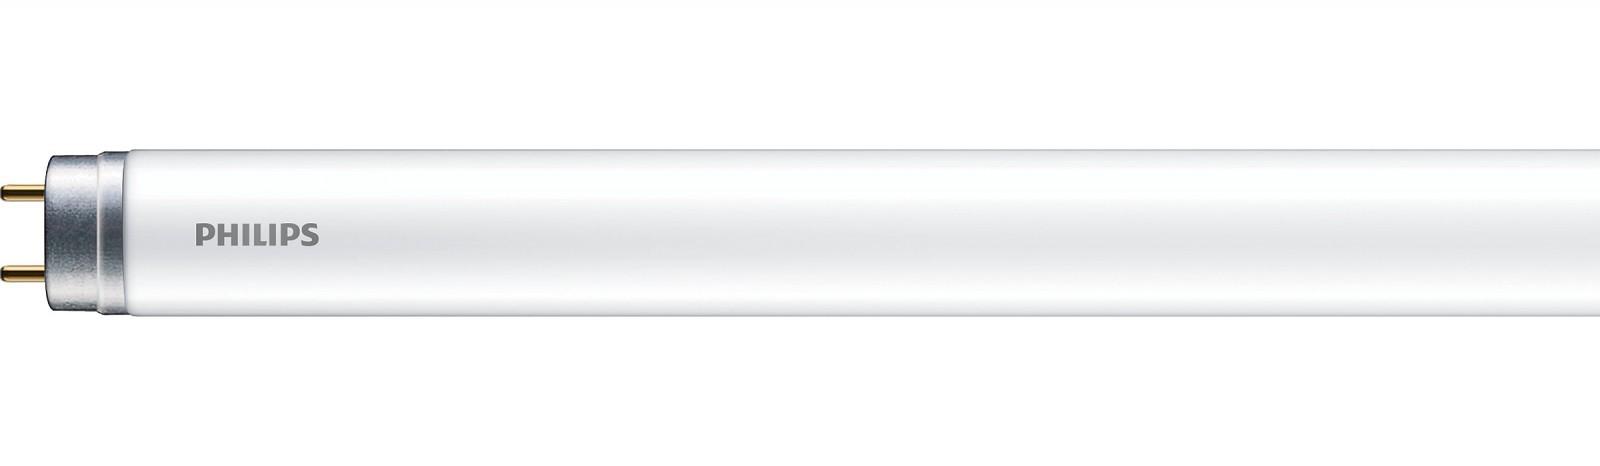 Tub LED Philips Ecofit T8, 20W, 2000 lm, 1500 mm, lumina rece 6500K